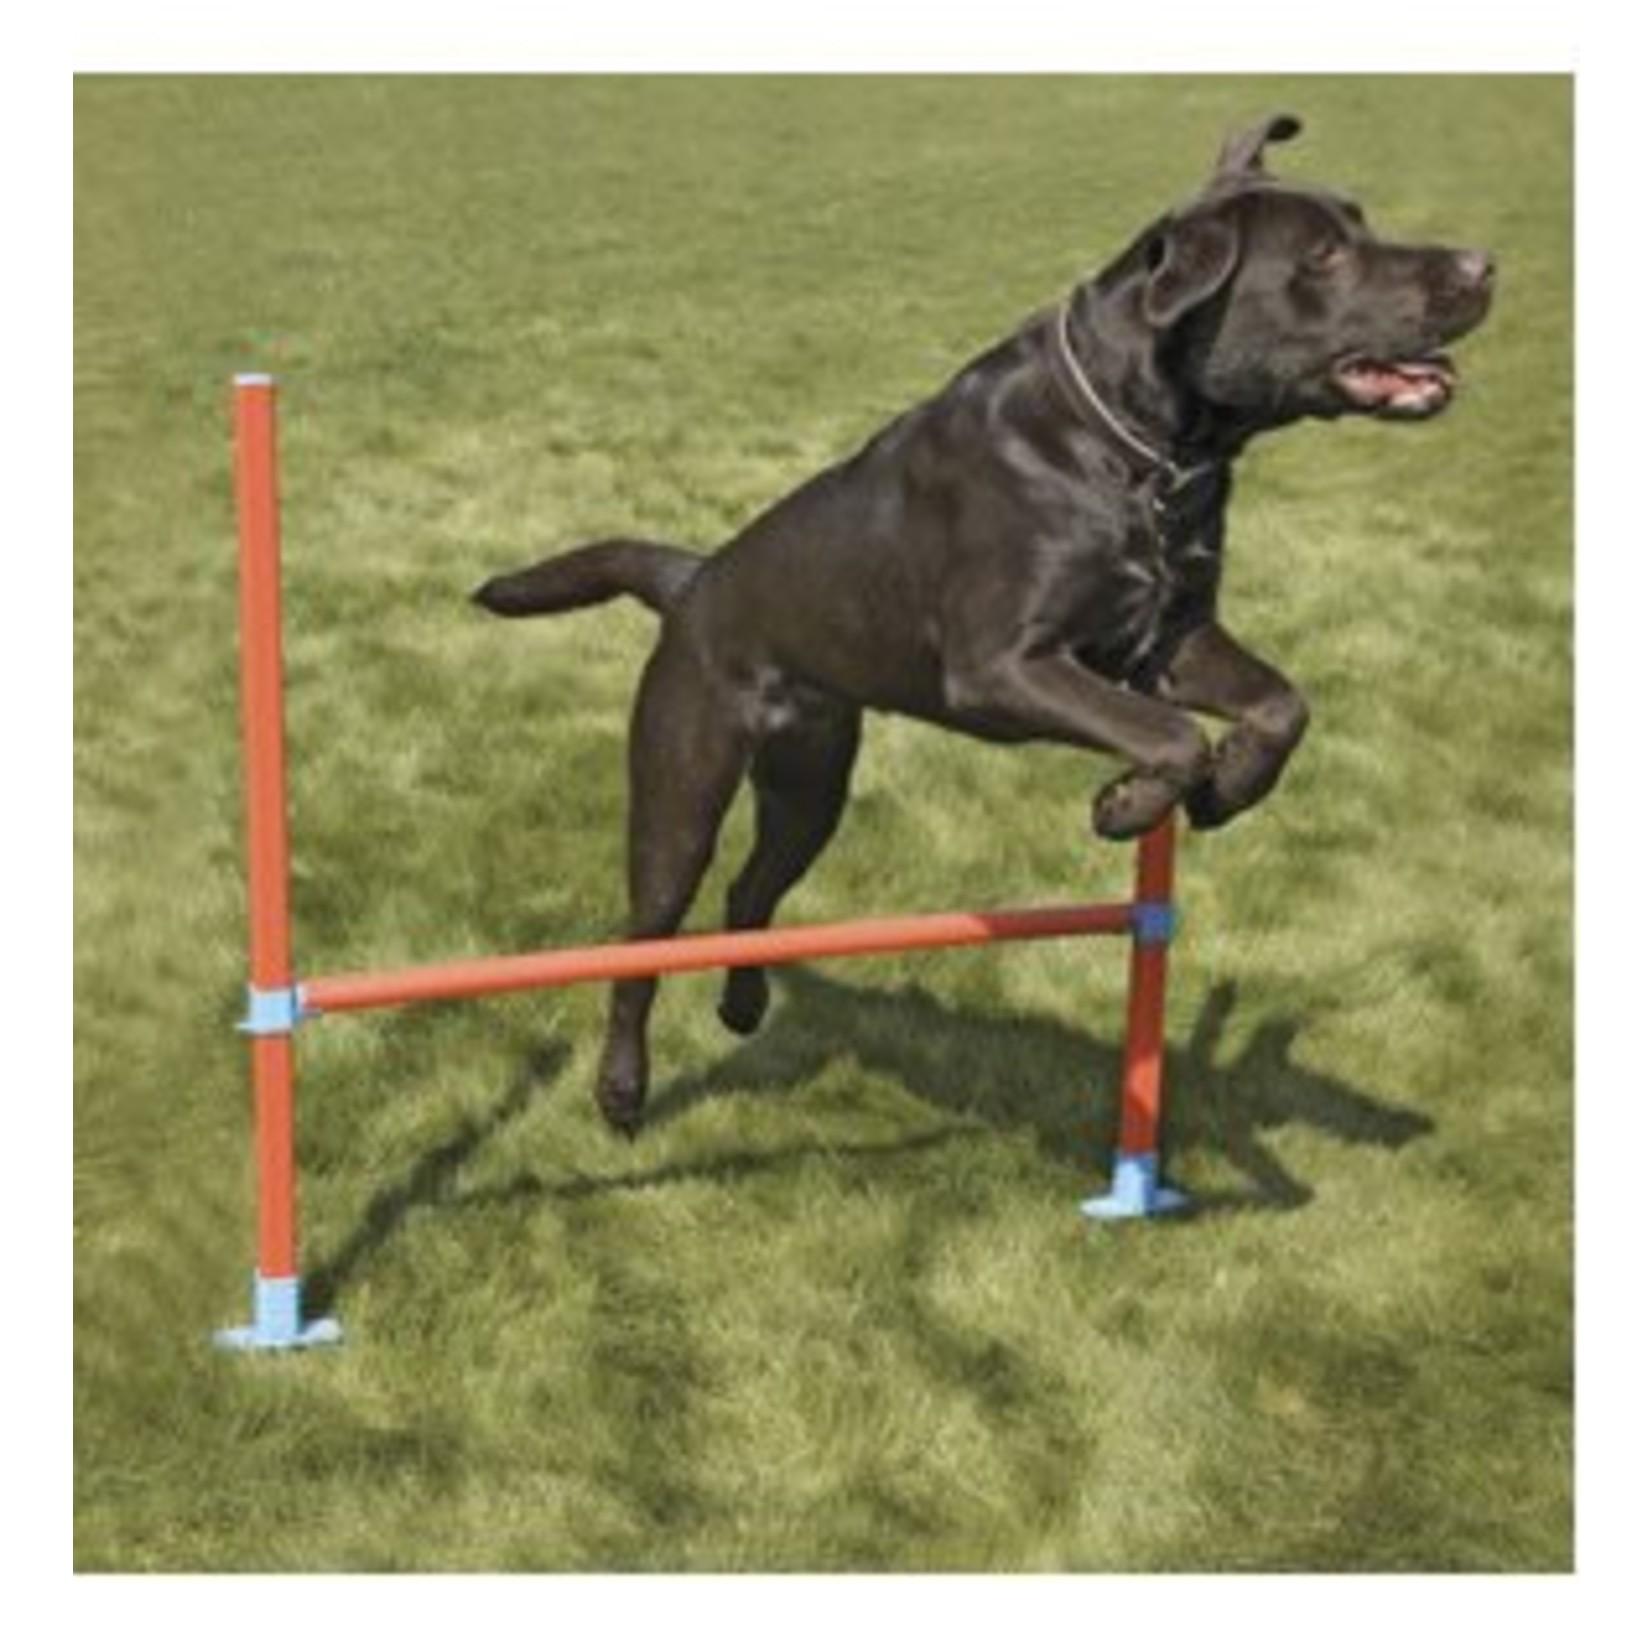 Rosewood Dog Agility Hurdle